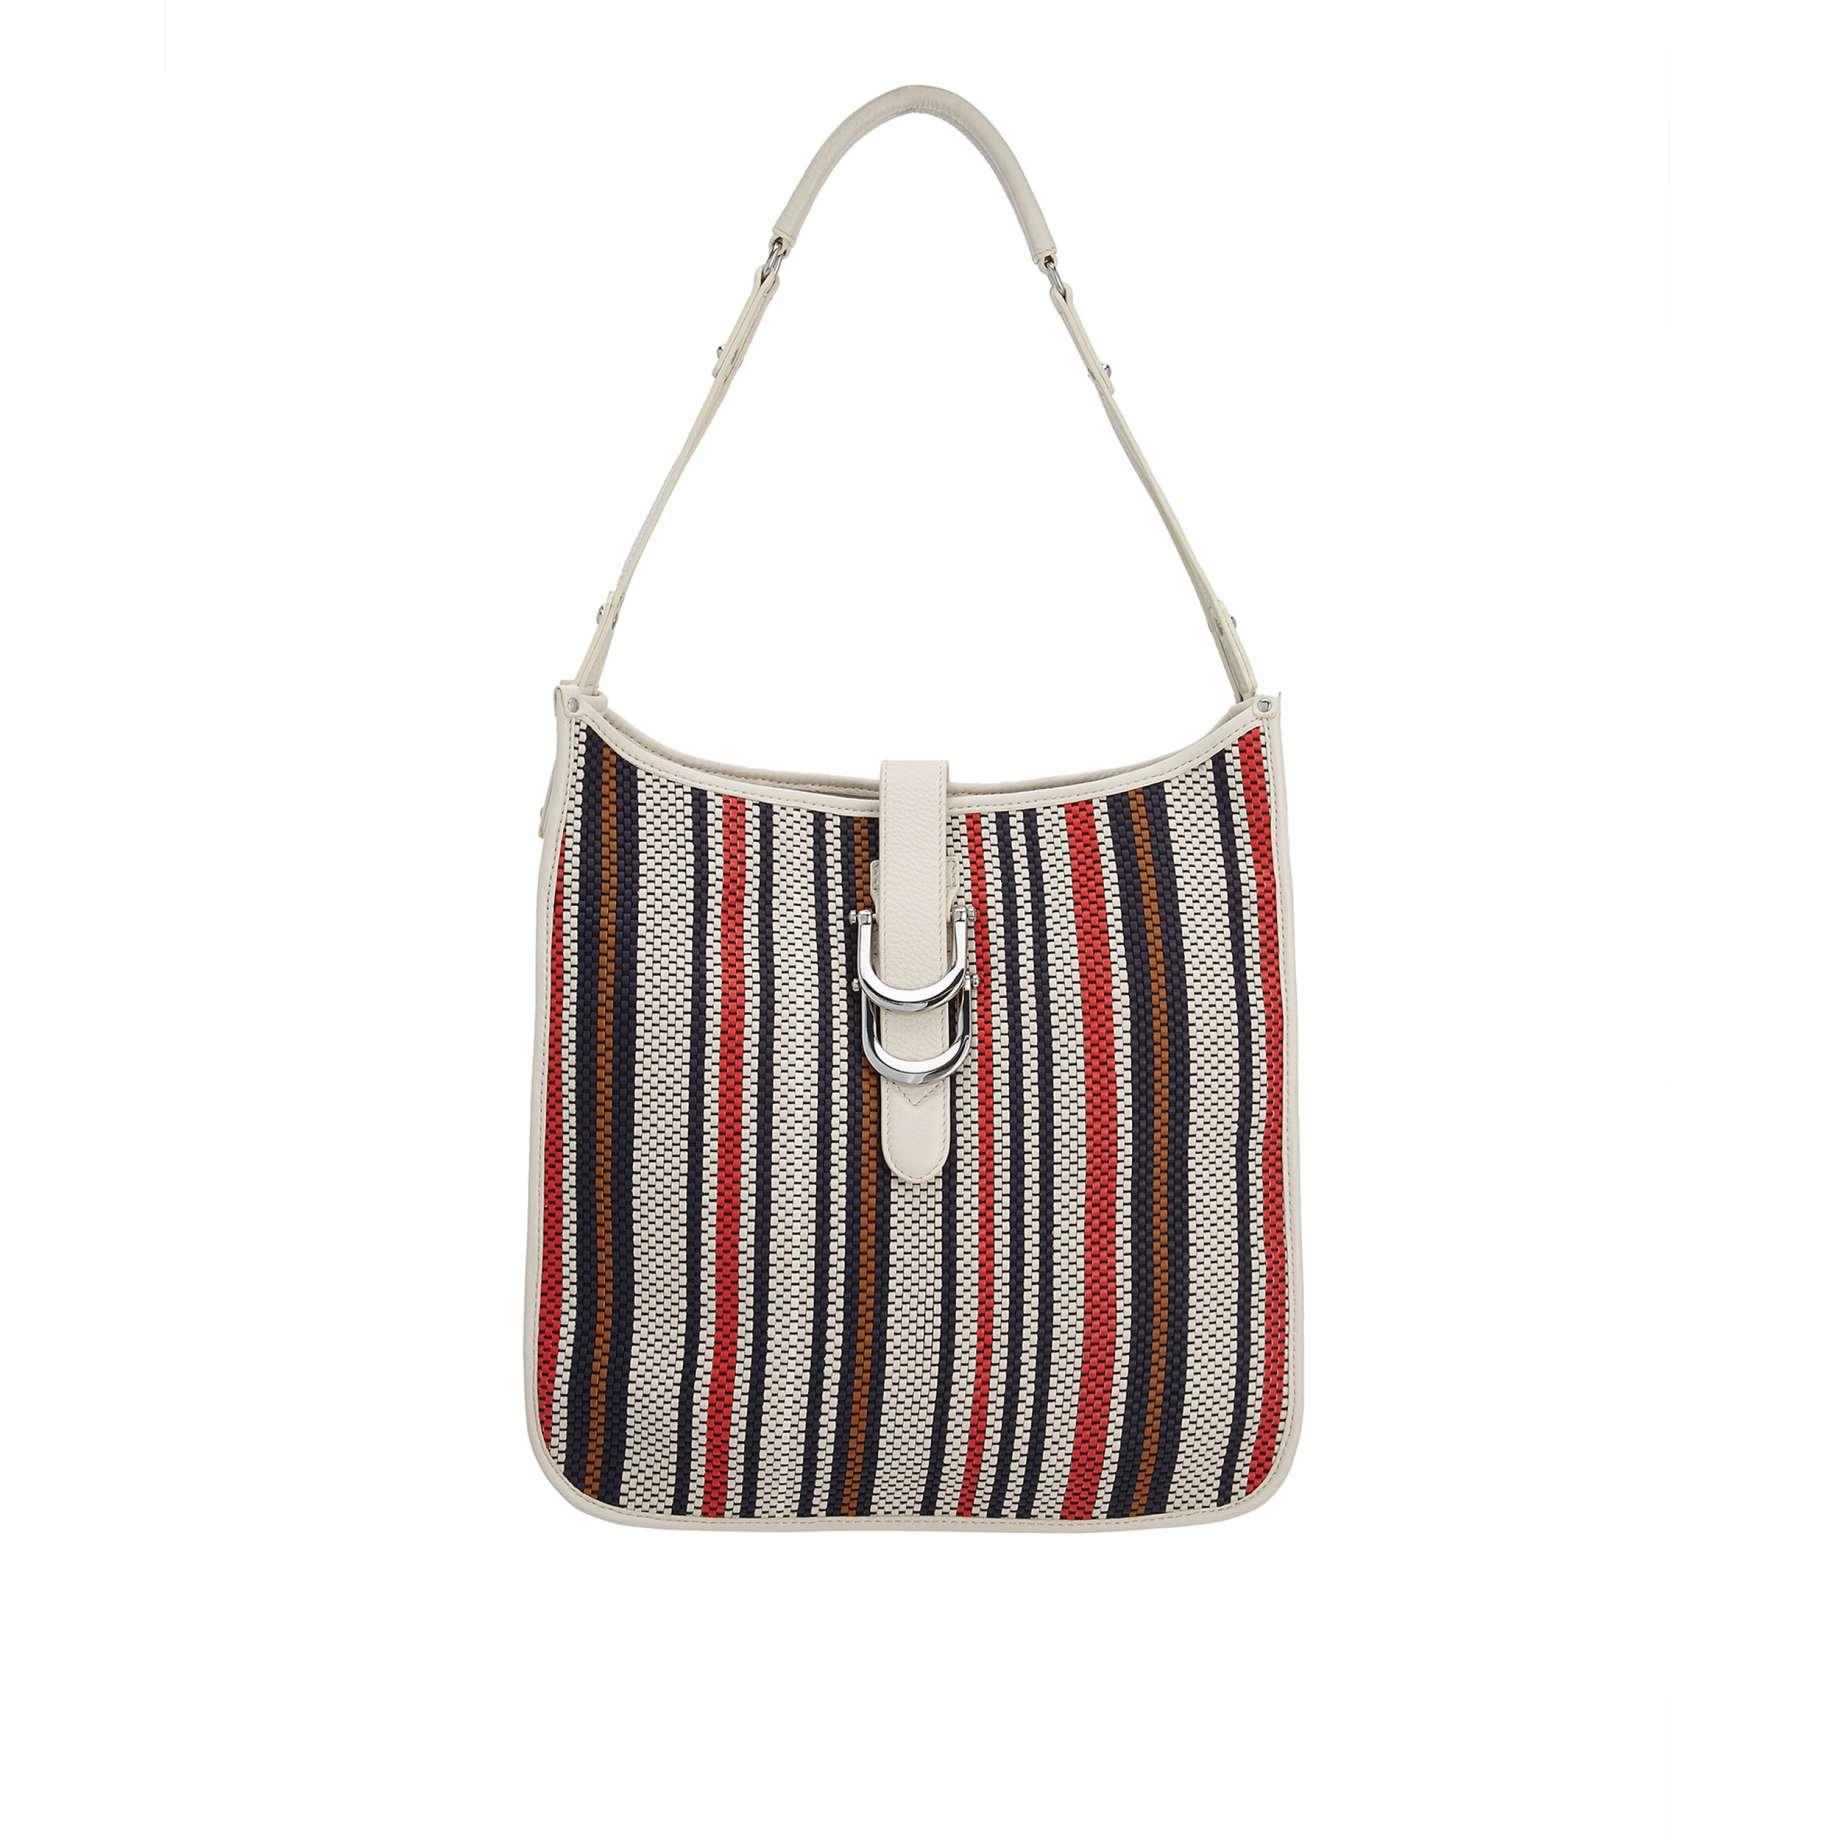 Meryl Hobo Bag By Sam Edelman View 1